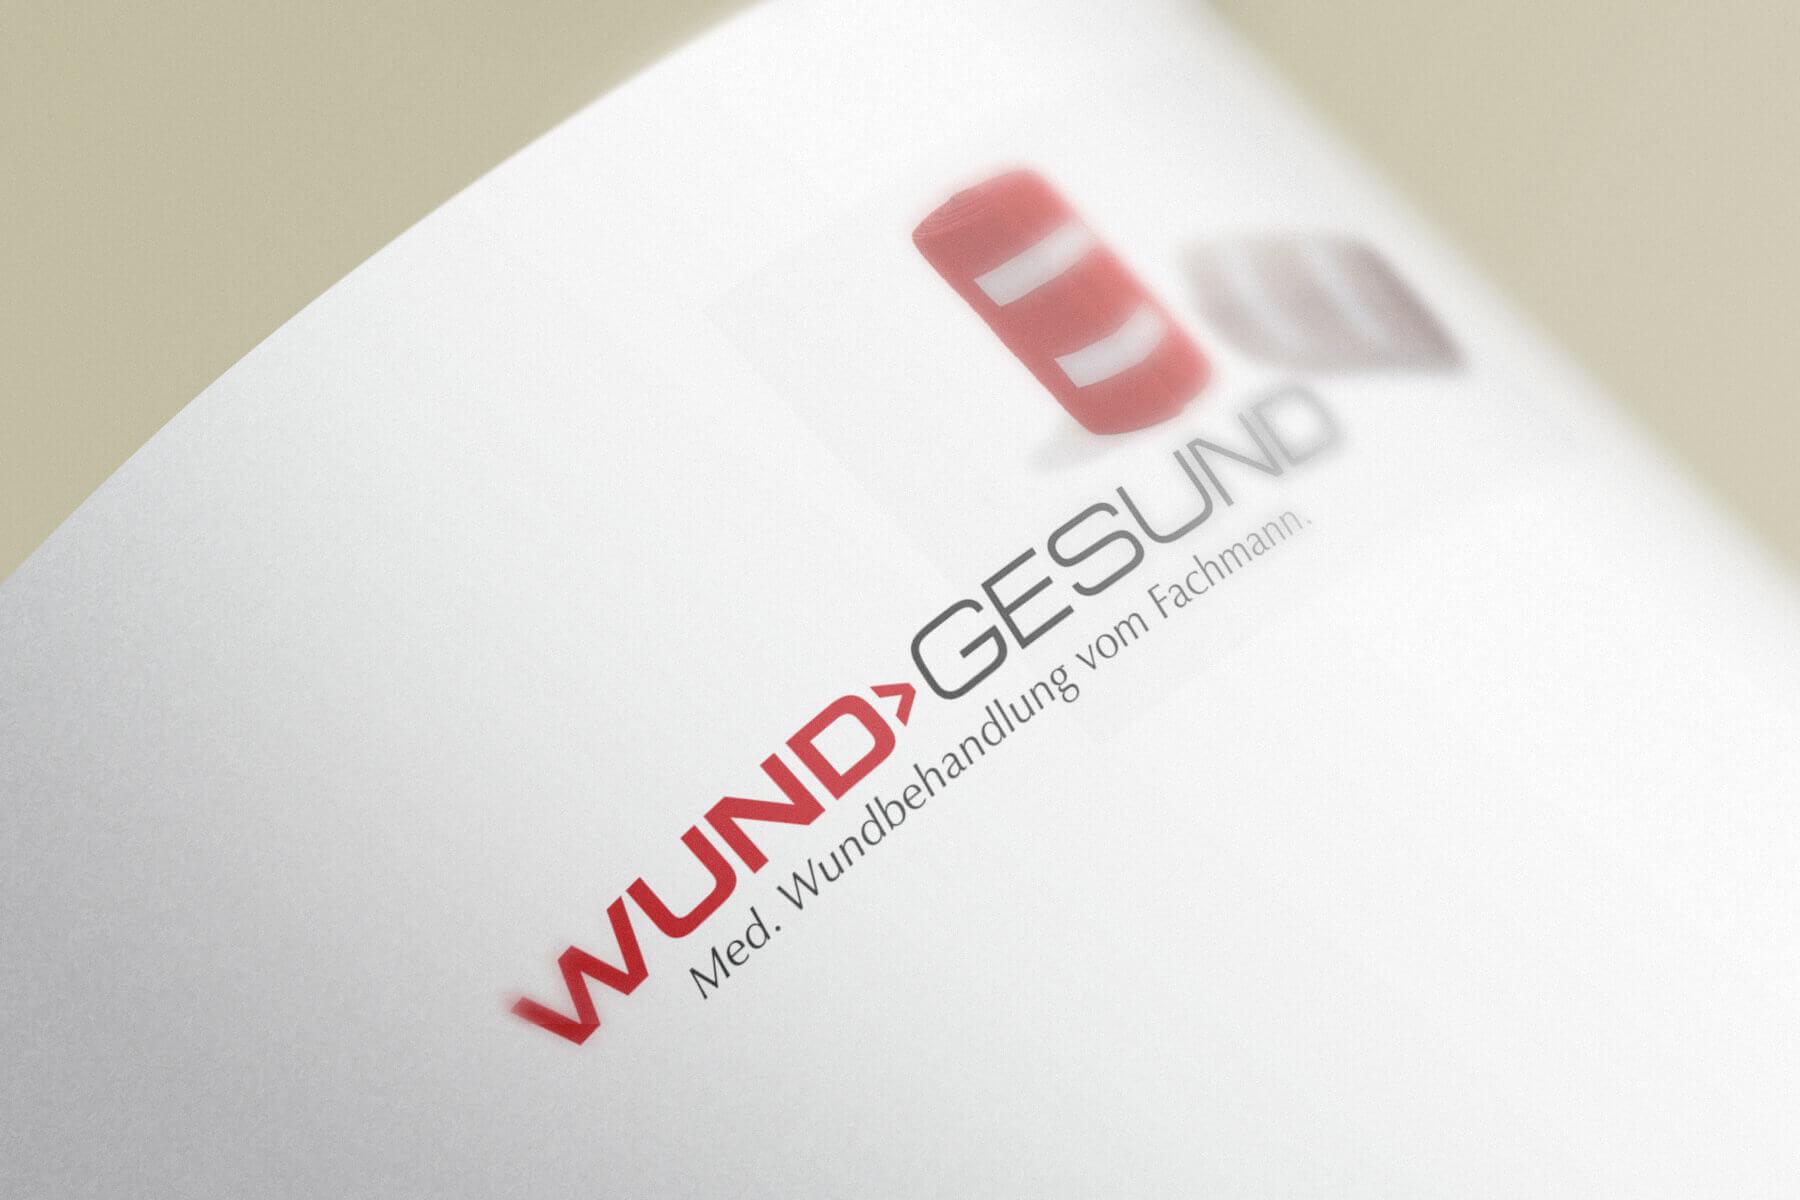 Wundgesund_1